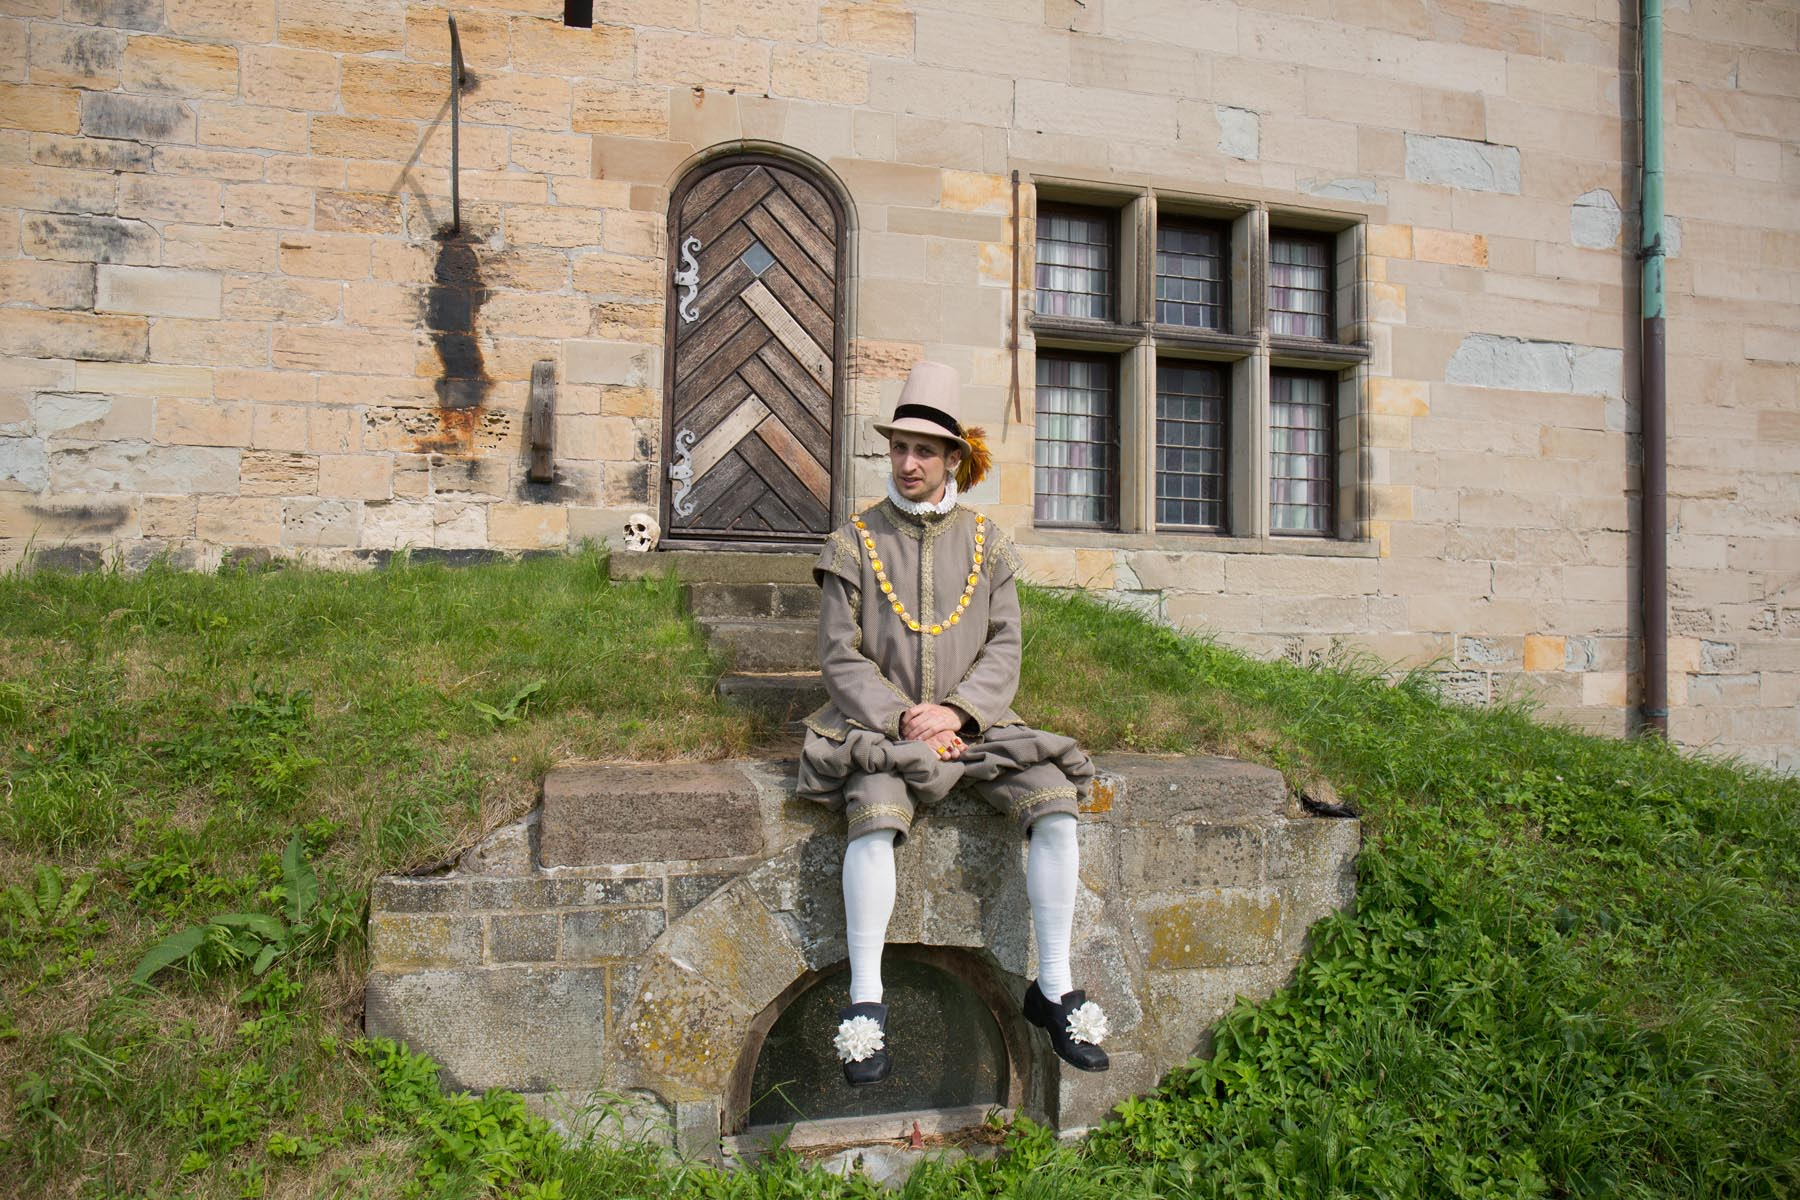 Horatio in front of Kronborg Castle photo: Torkild Jensen